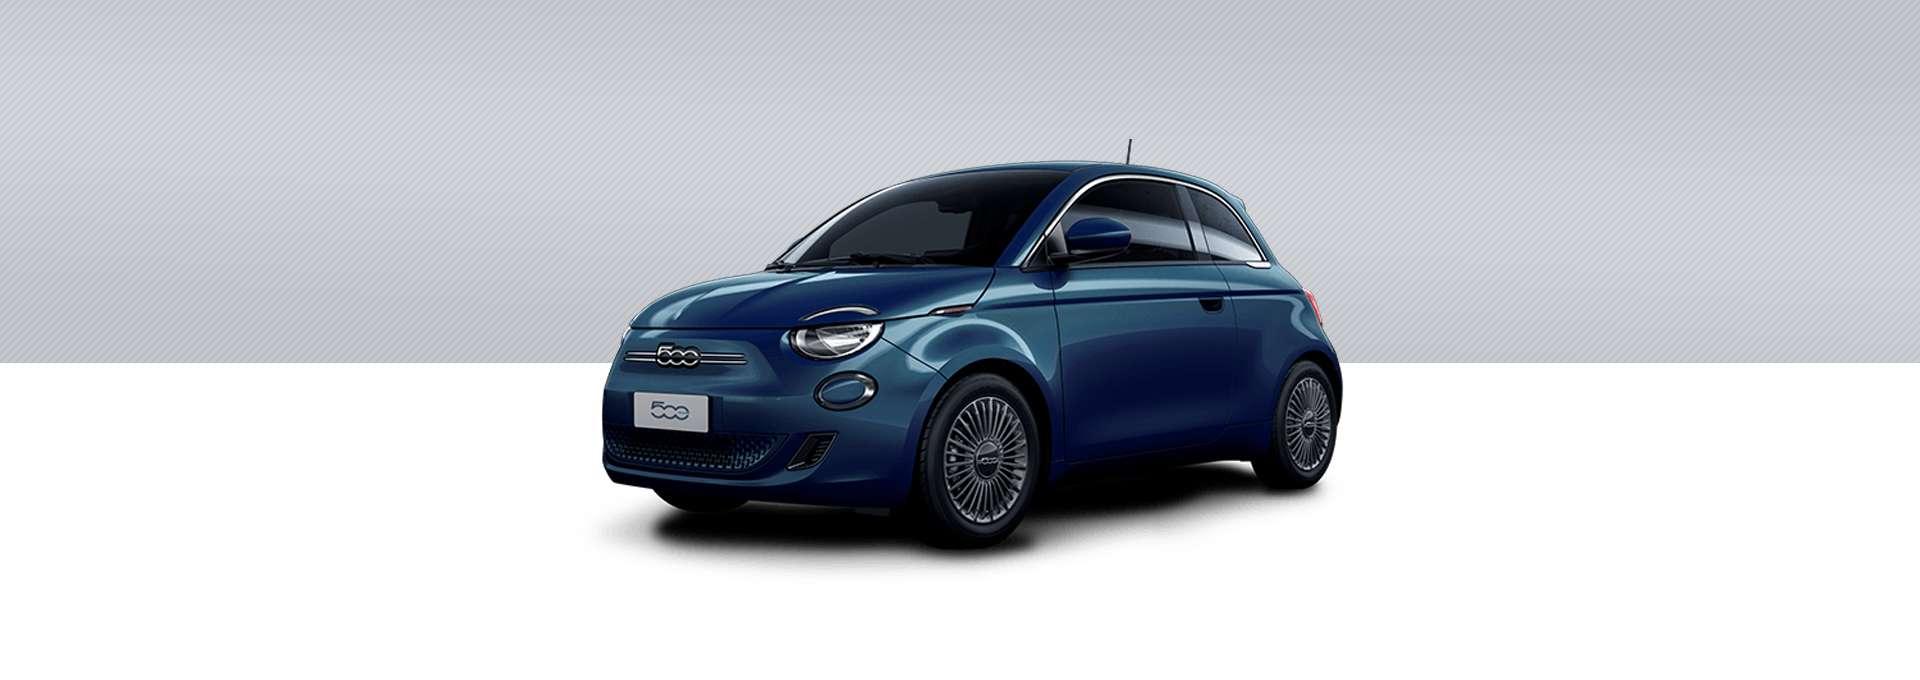 Fiat NUEVO 500 E BERLINA